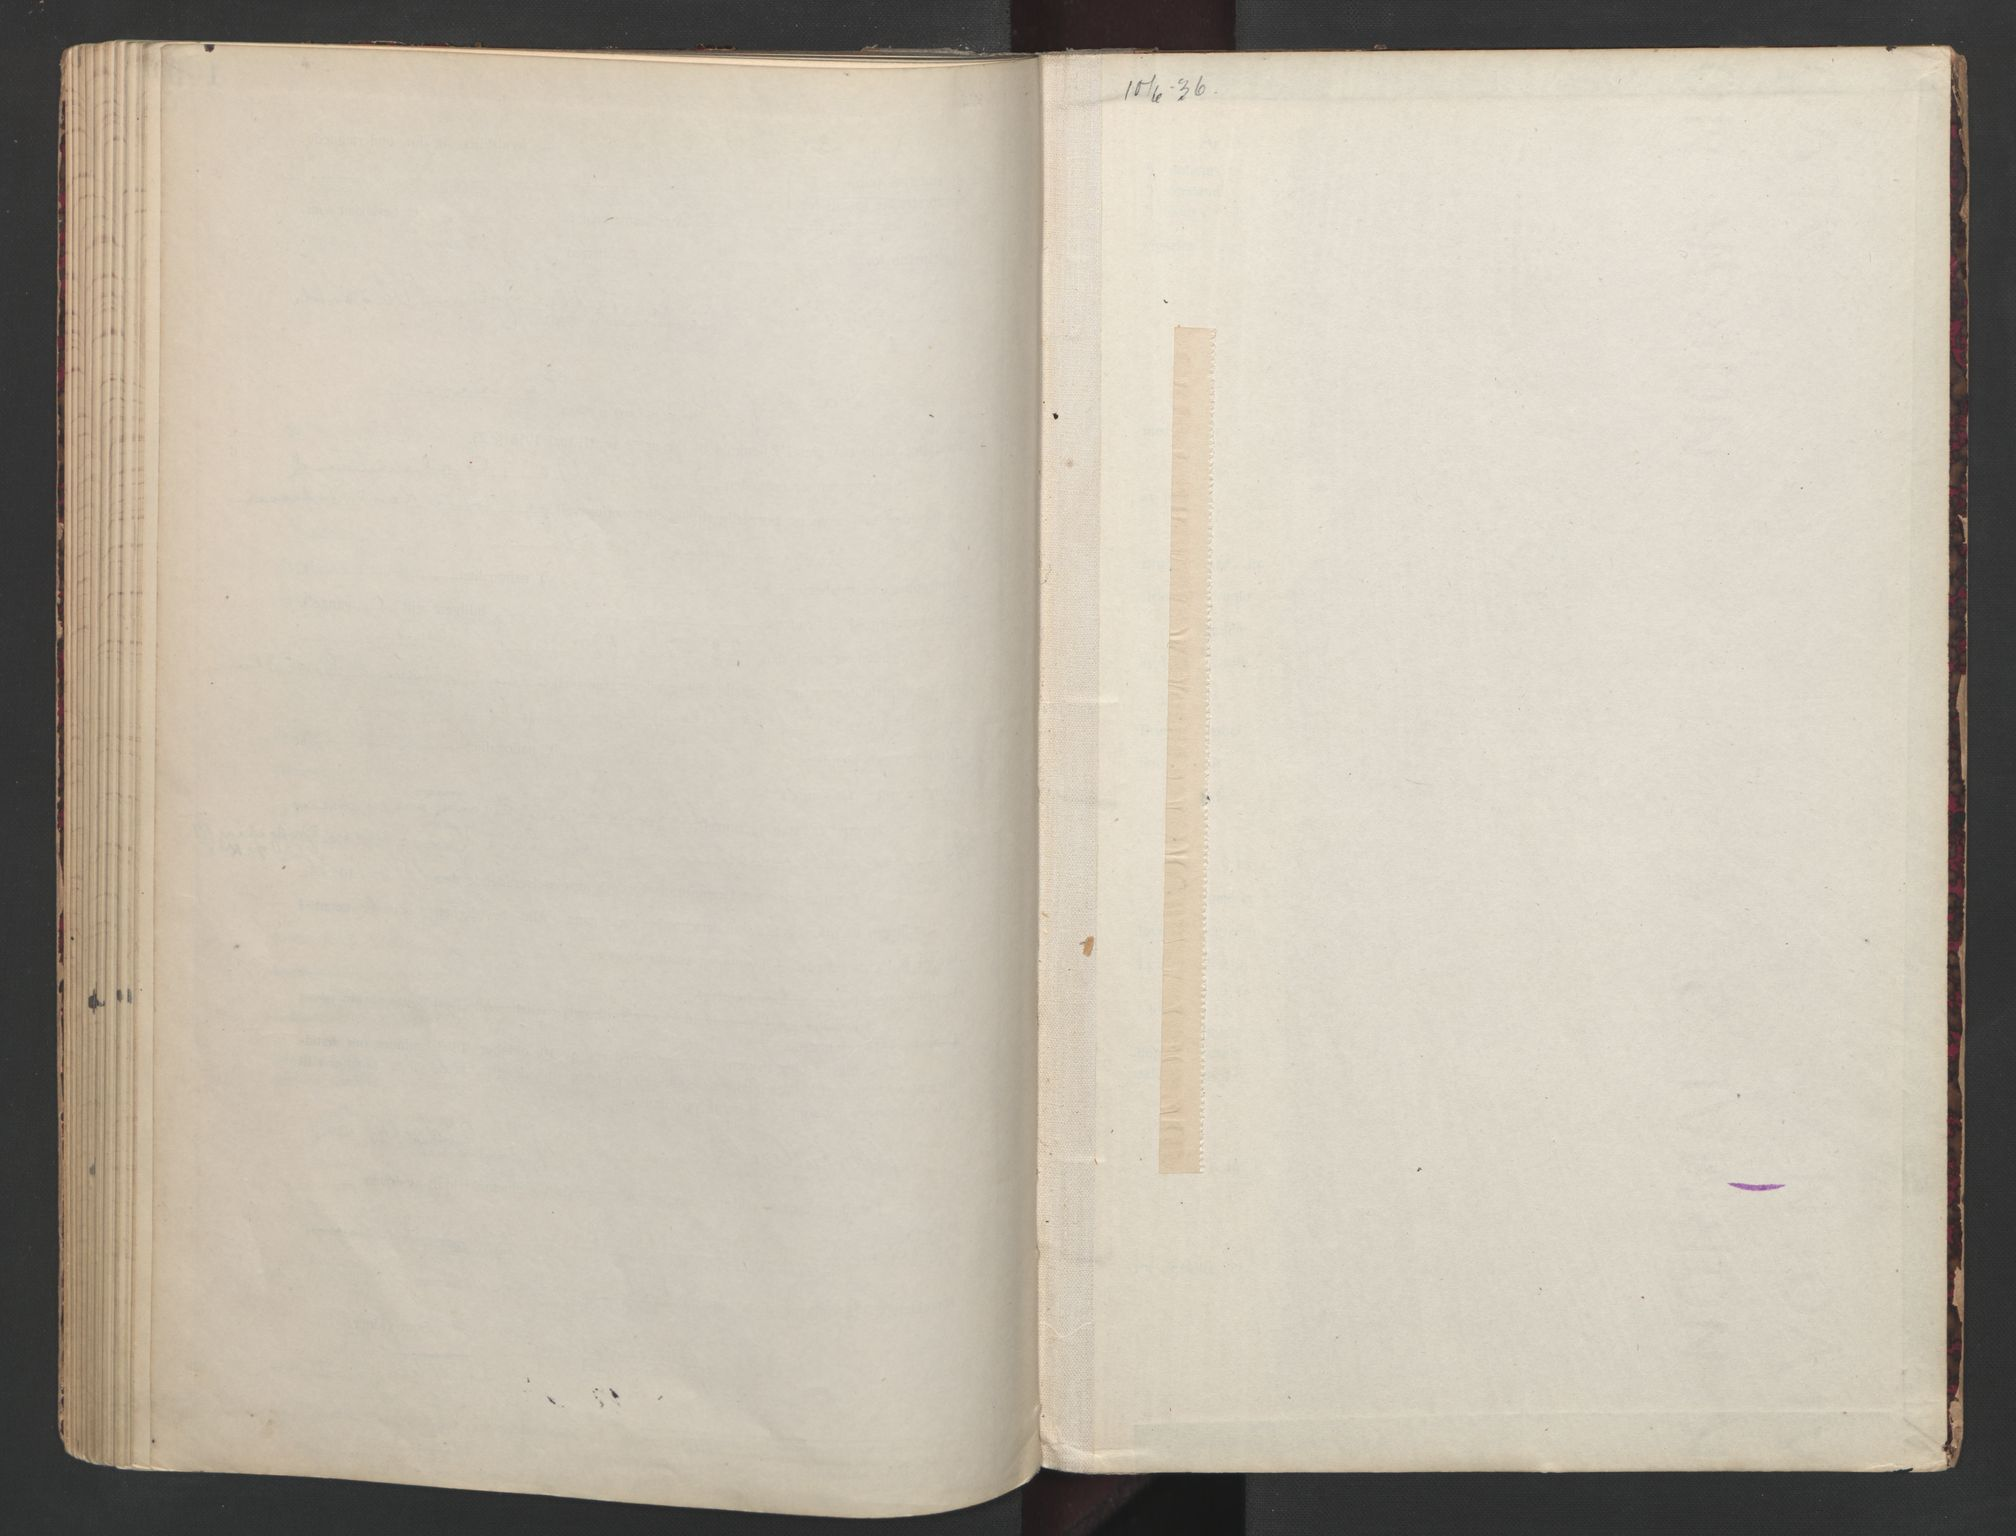 SAO, Aker sorenskriveri, L/Lc/Lcb/L0008: Vigselprotokoll, 1935-1936, s. upaginert